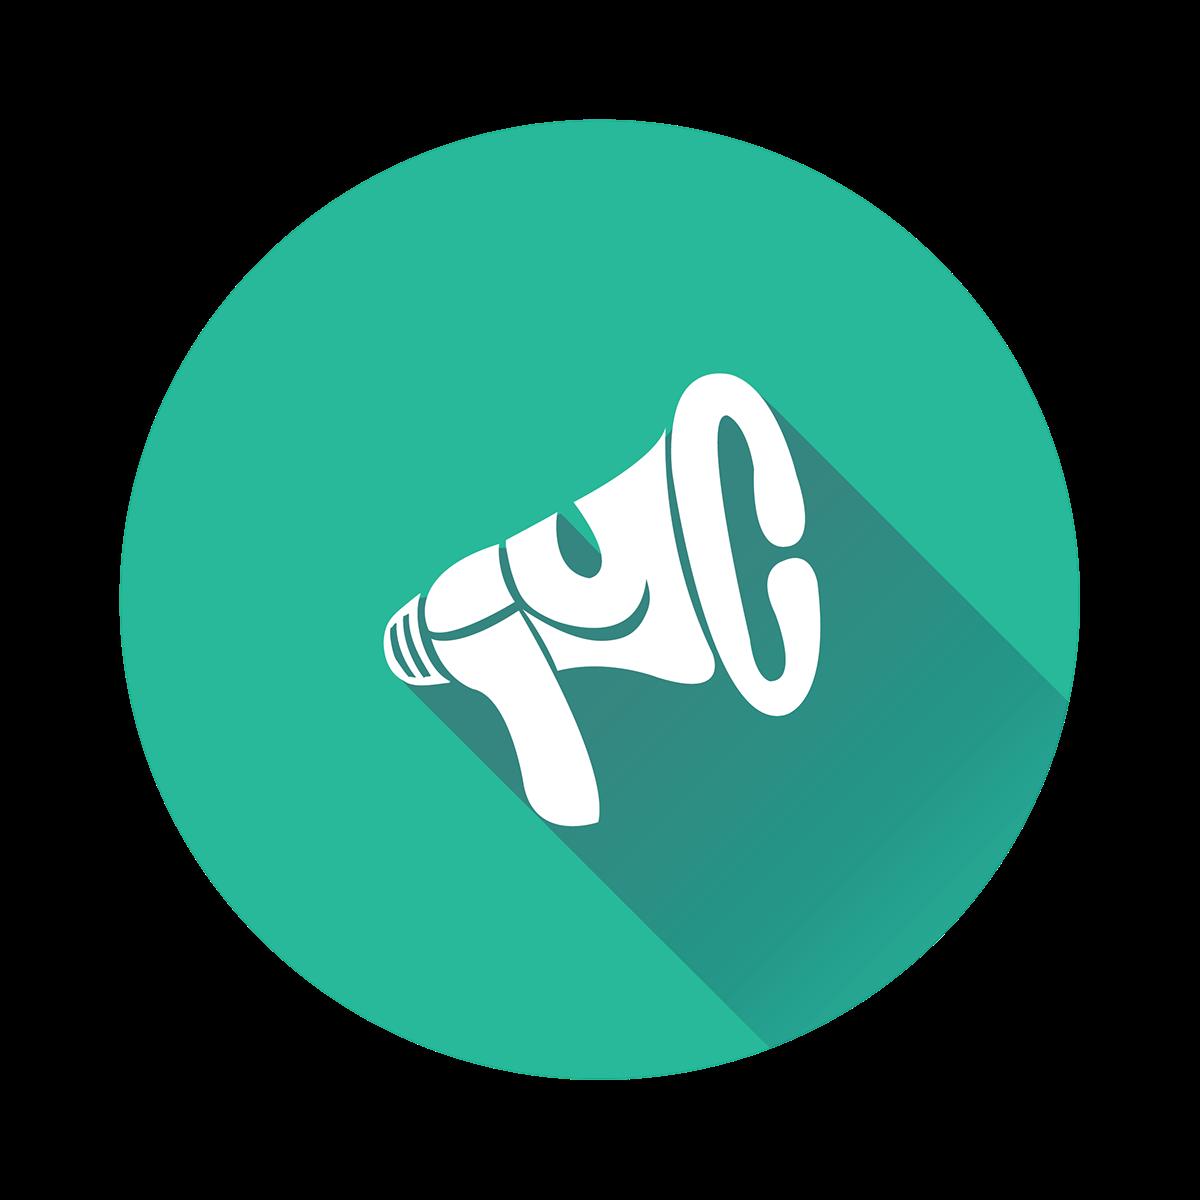 indonesia jakarta forum festival conference youth logo identity Tagline digital prints motion